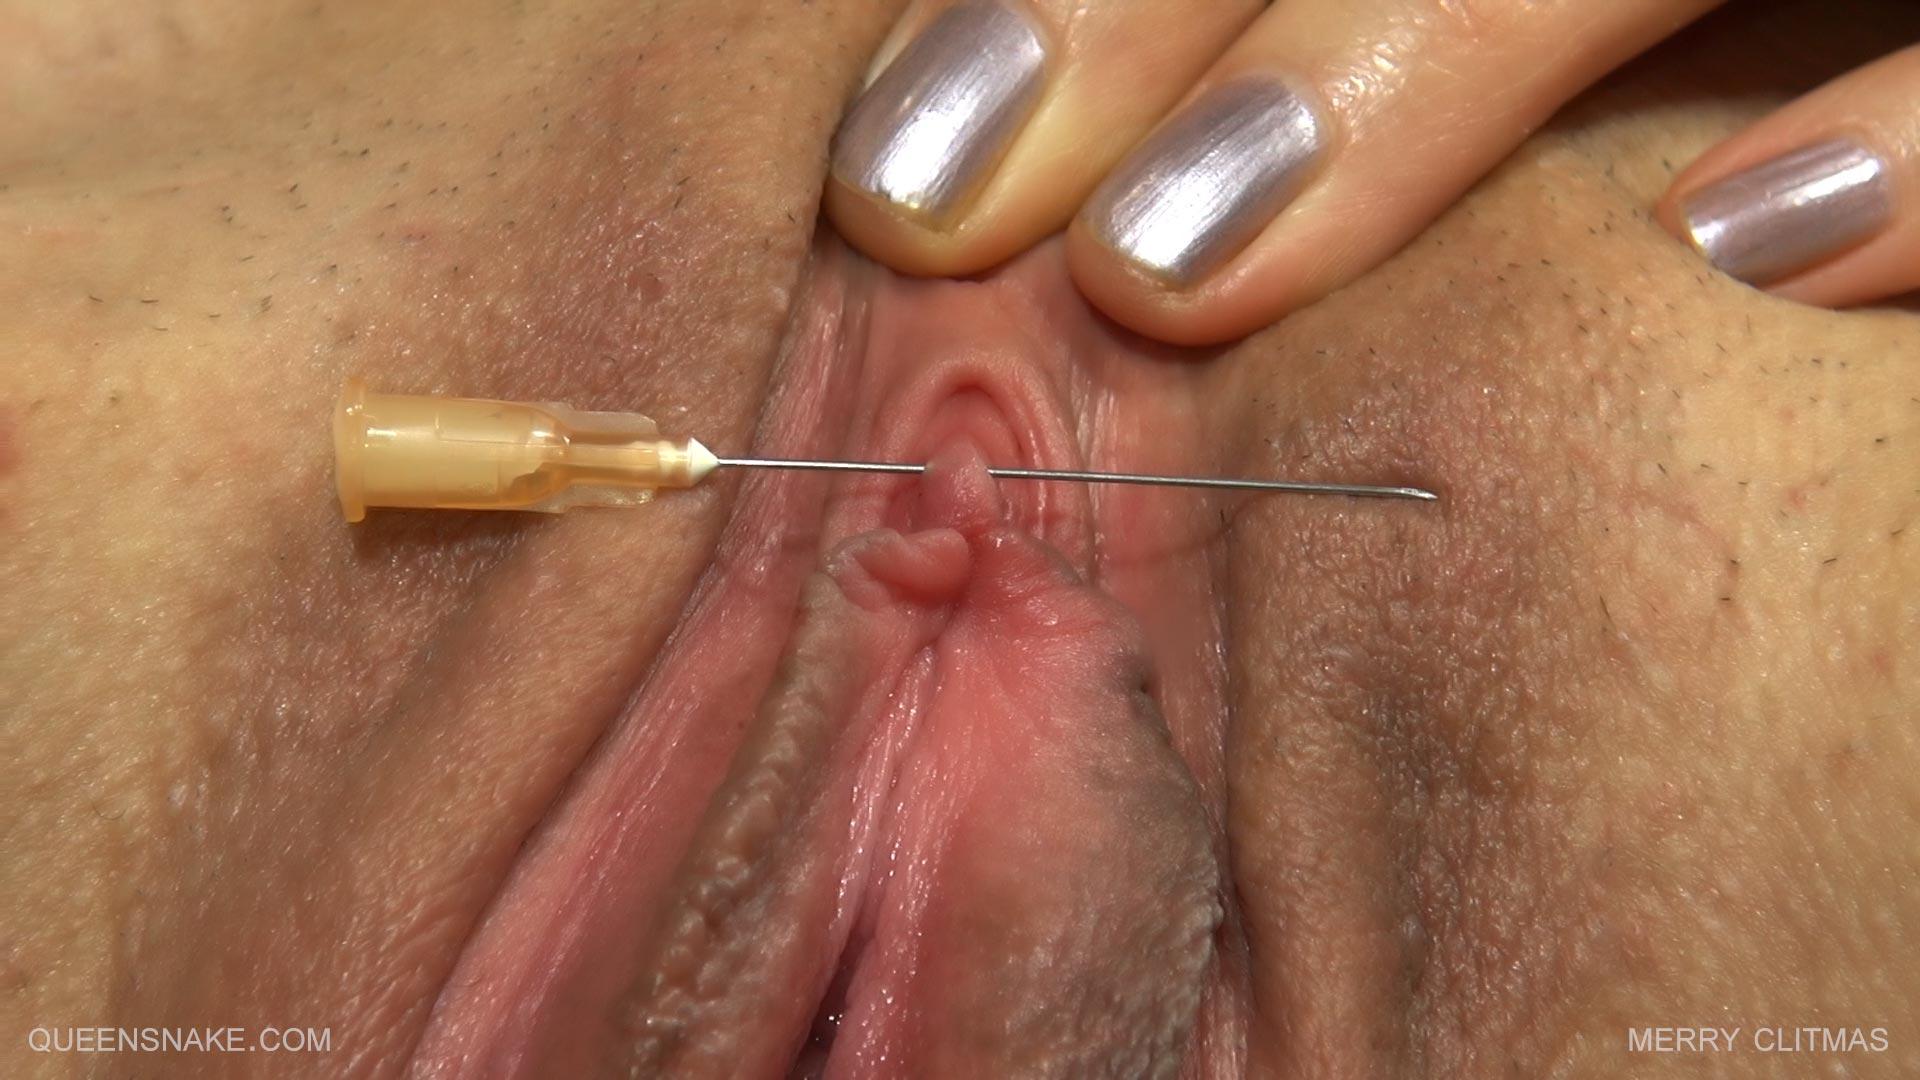 Sexy pierced nipples on webcam